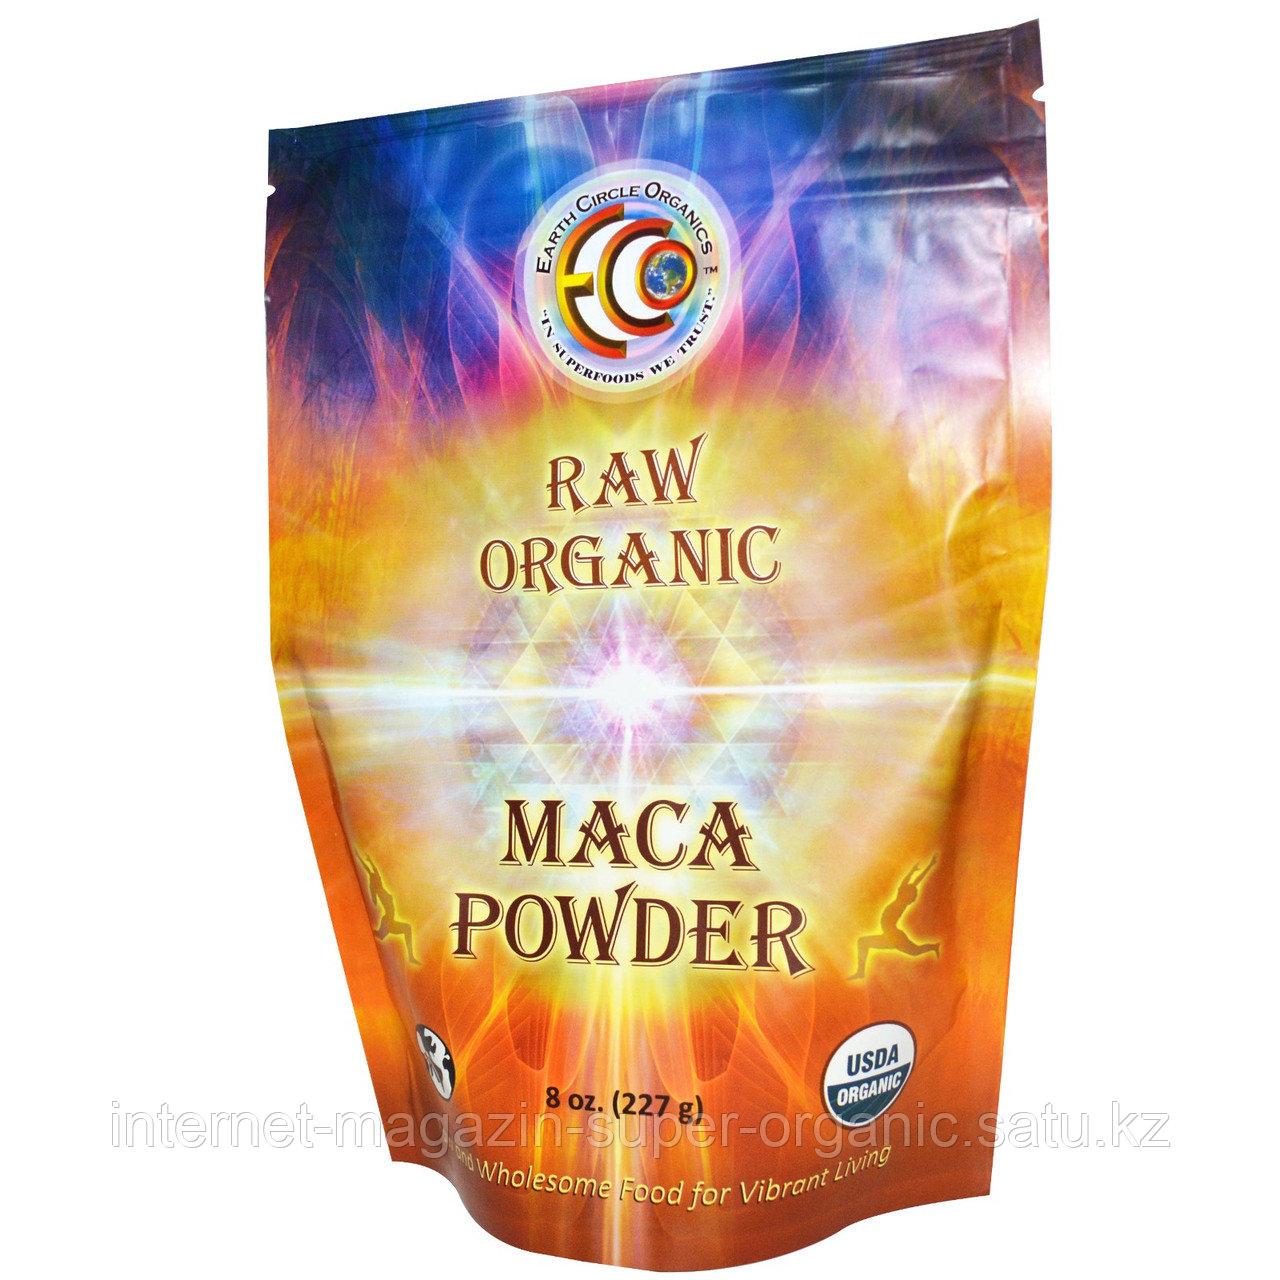 Мака натуральная порошок, 227 гр (Raw Organic Maca Powder), Earth Circle Organics